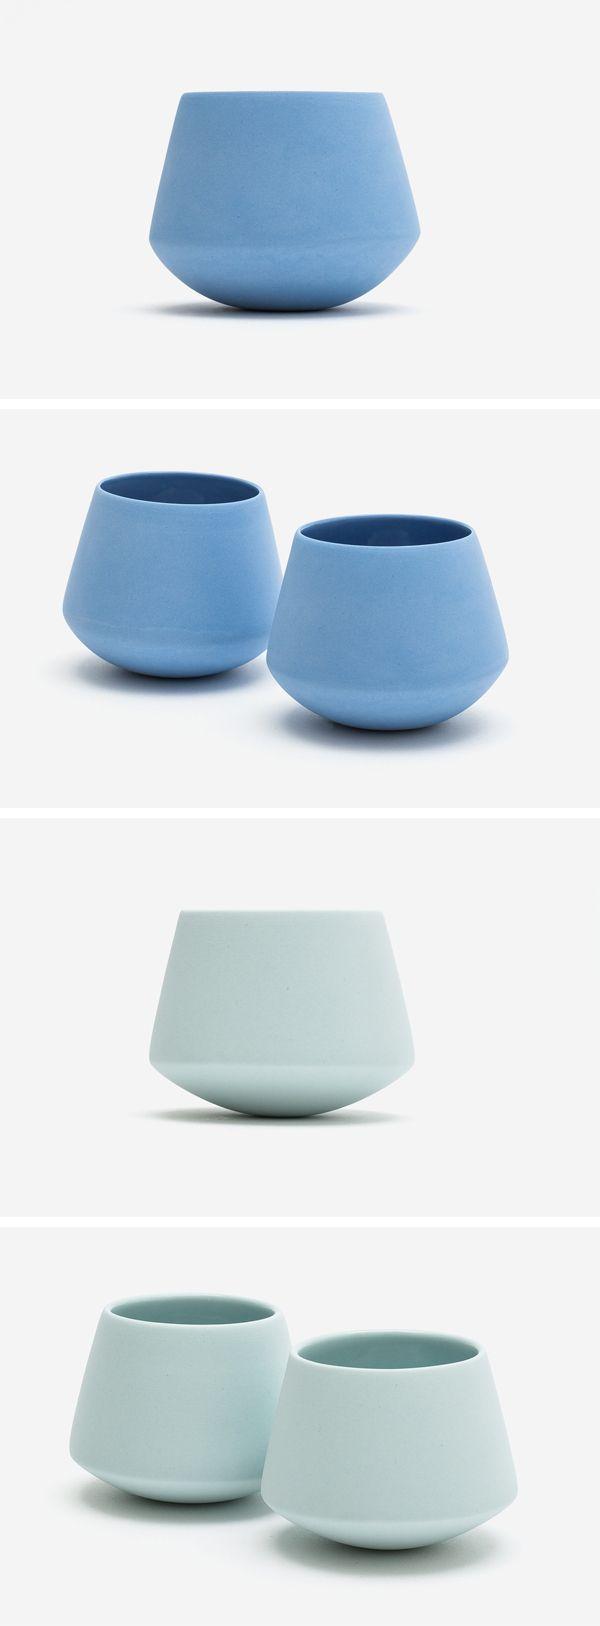 Porcelain Cup Small | by Elke van den Berg